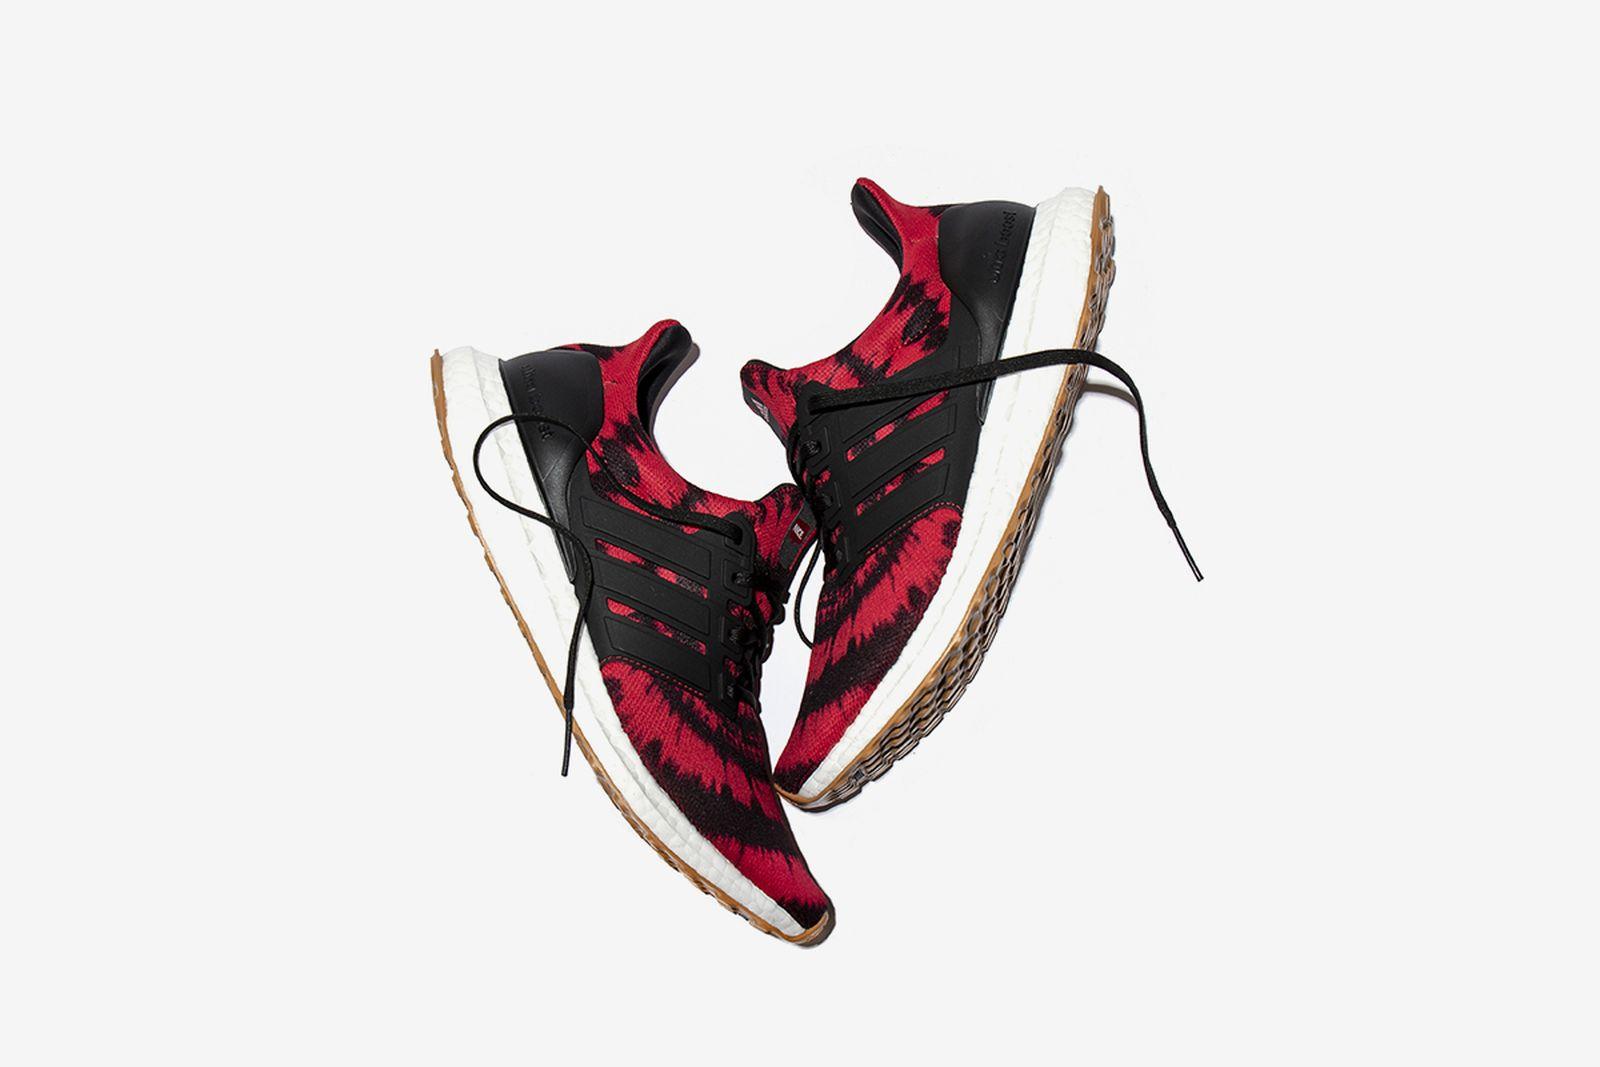 nice-kicks-adidas-ultraboost-no-vacancy-release-date-price-1-04